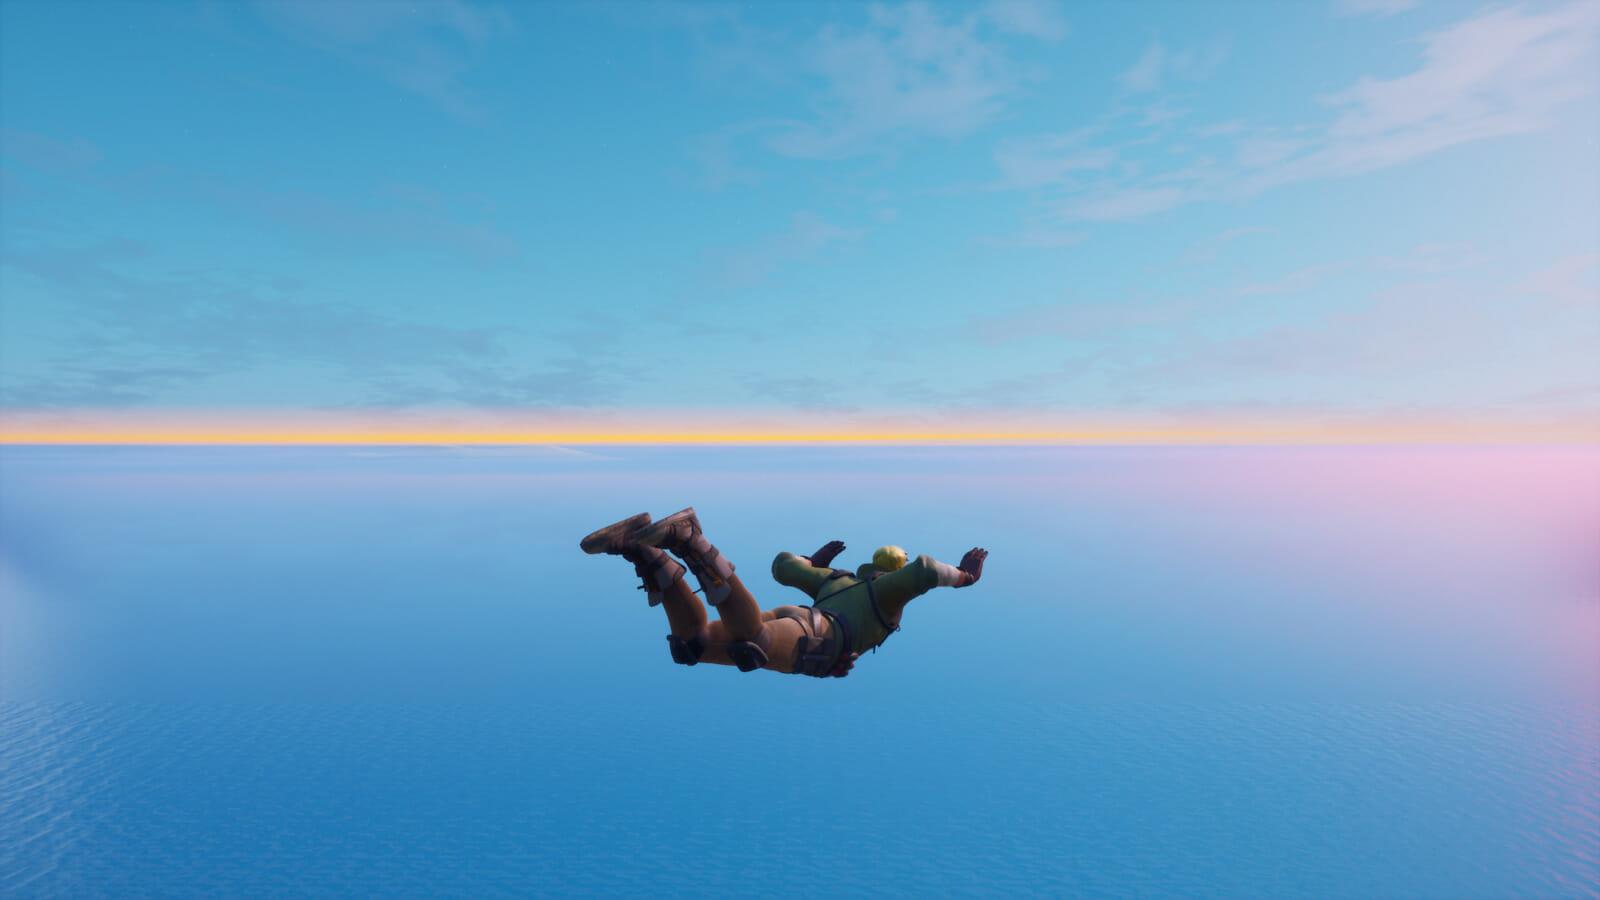 """STORM SURGE | THE FINAL SEASON"" Island by mtg_apollo ..."